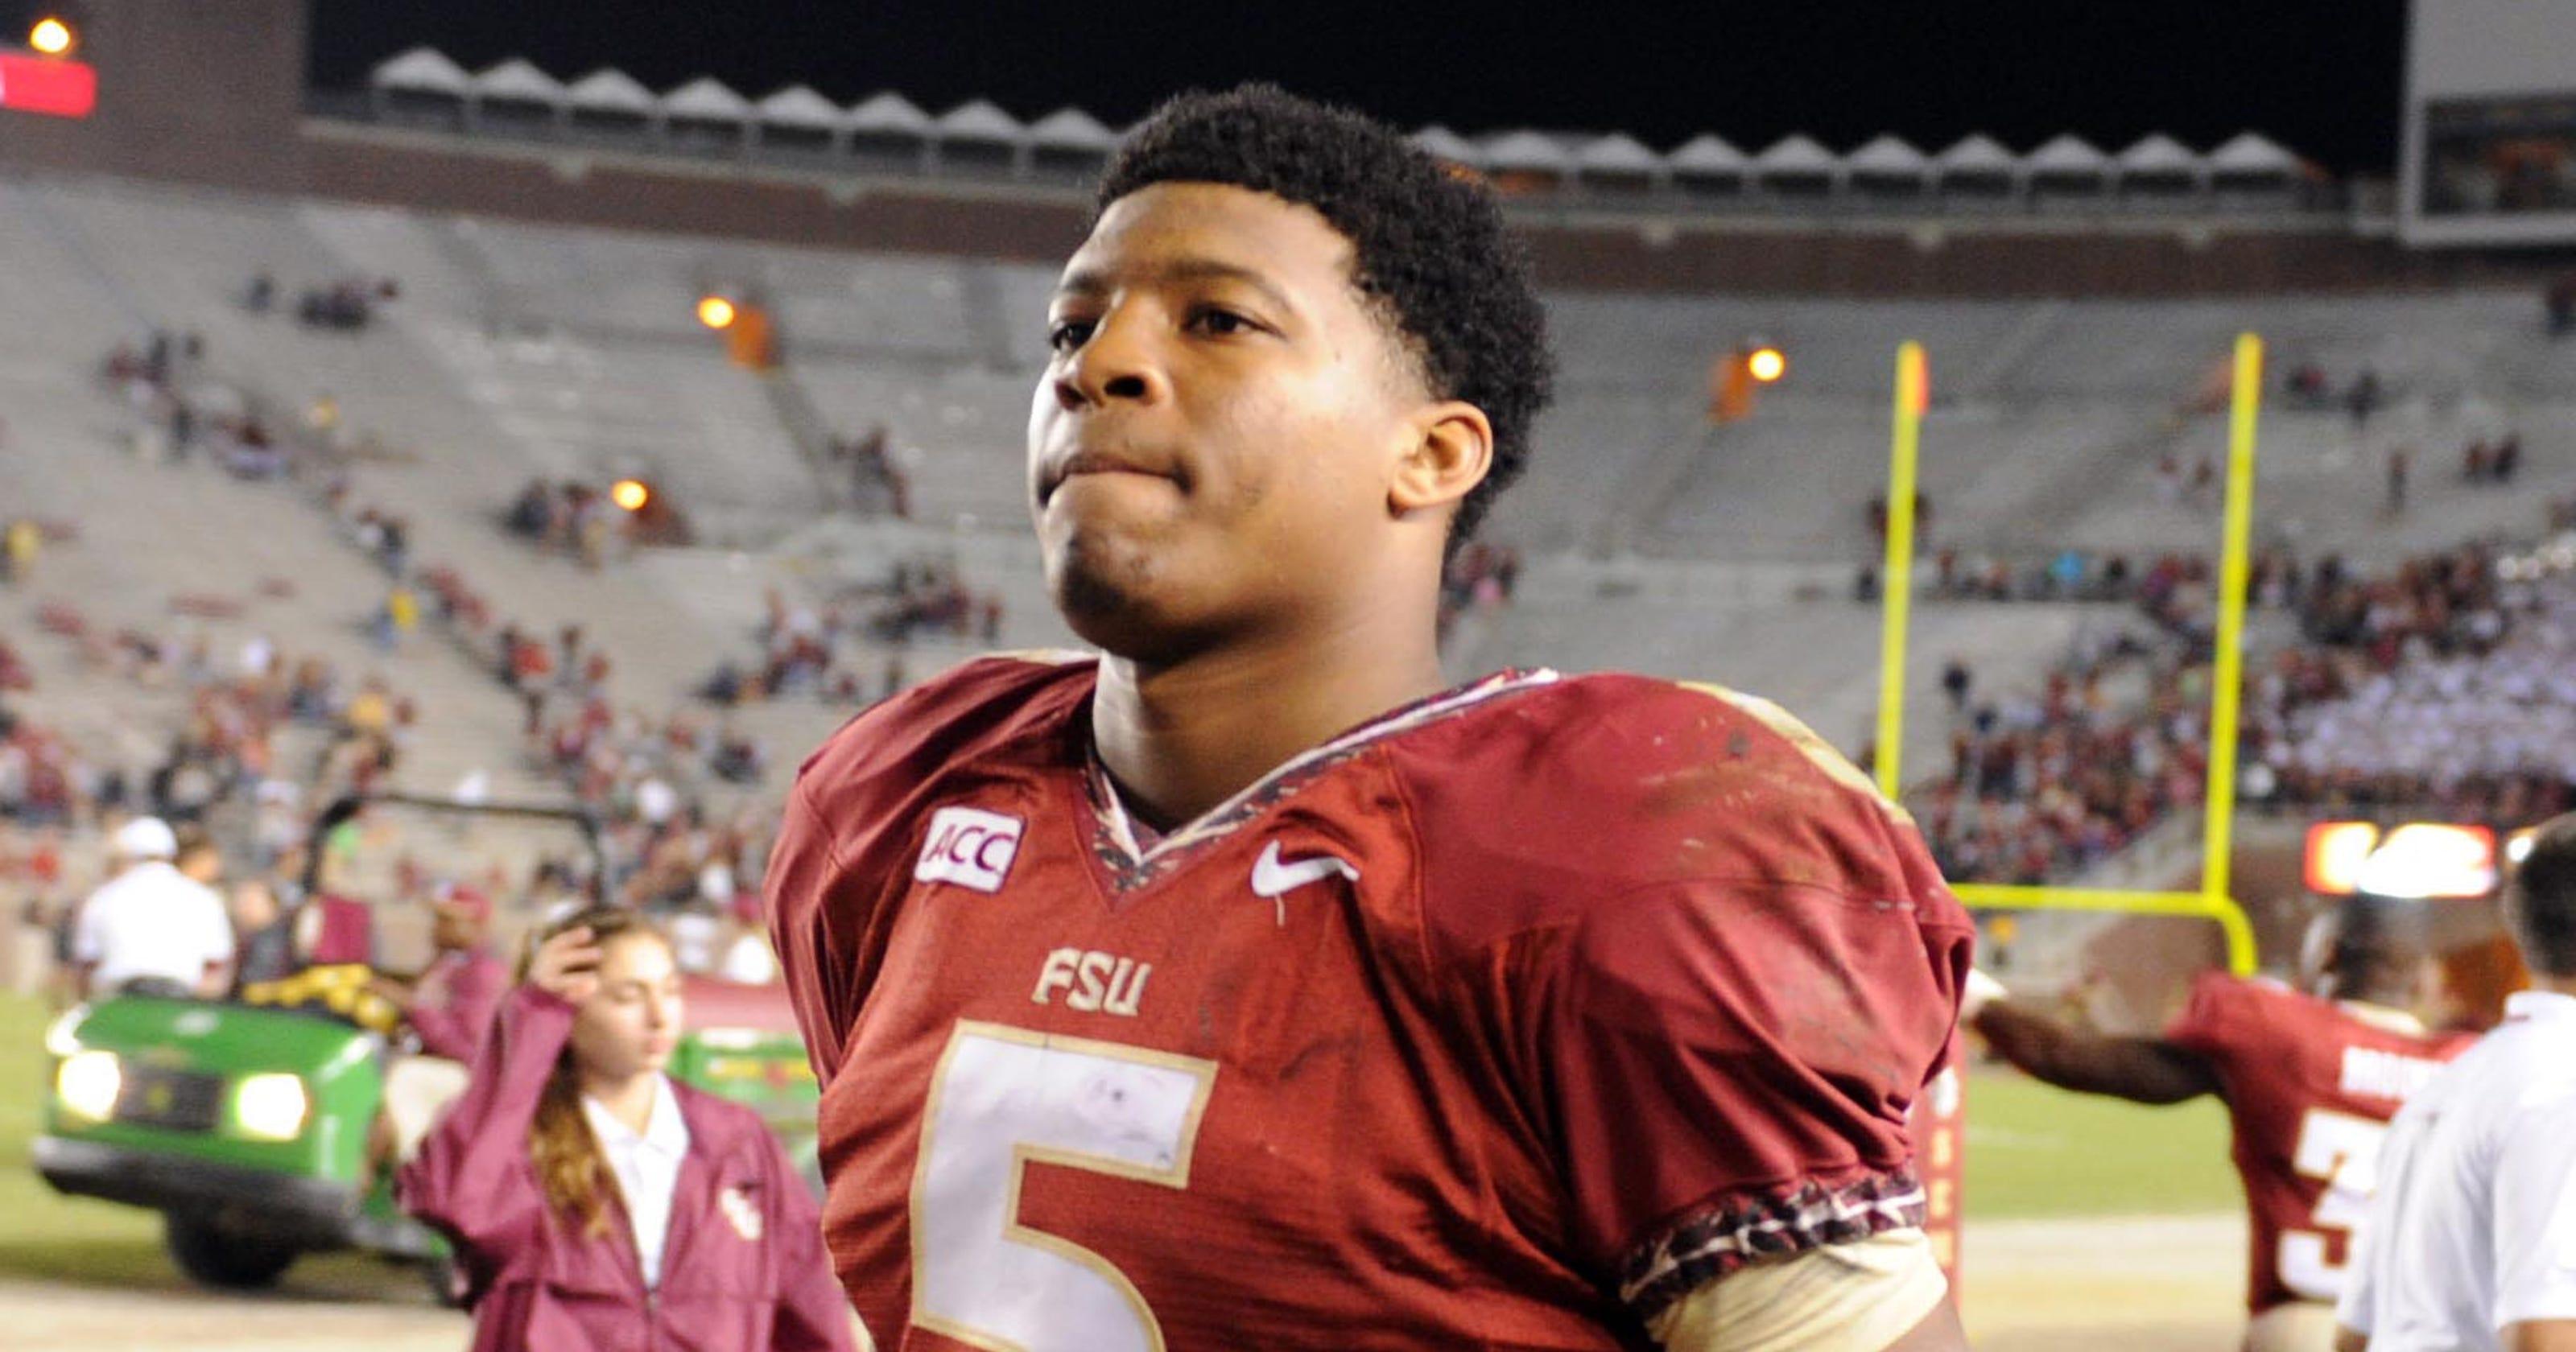 Florida State's Jameis Winston leads Heisman finalist list